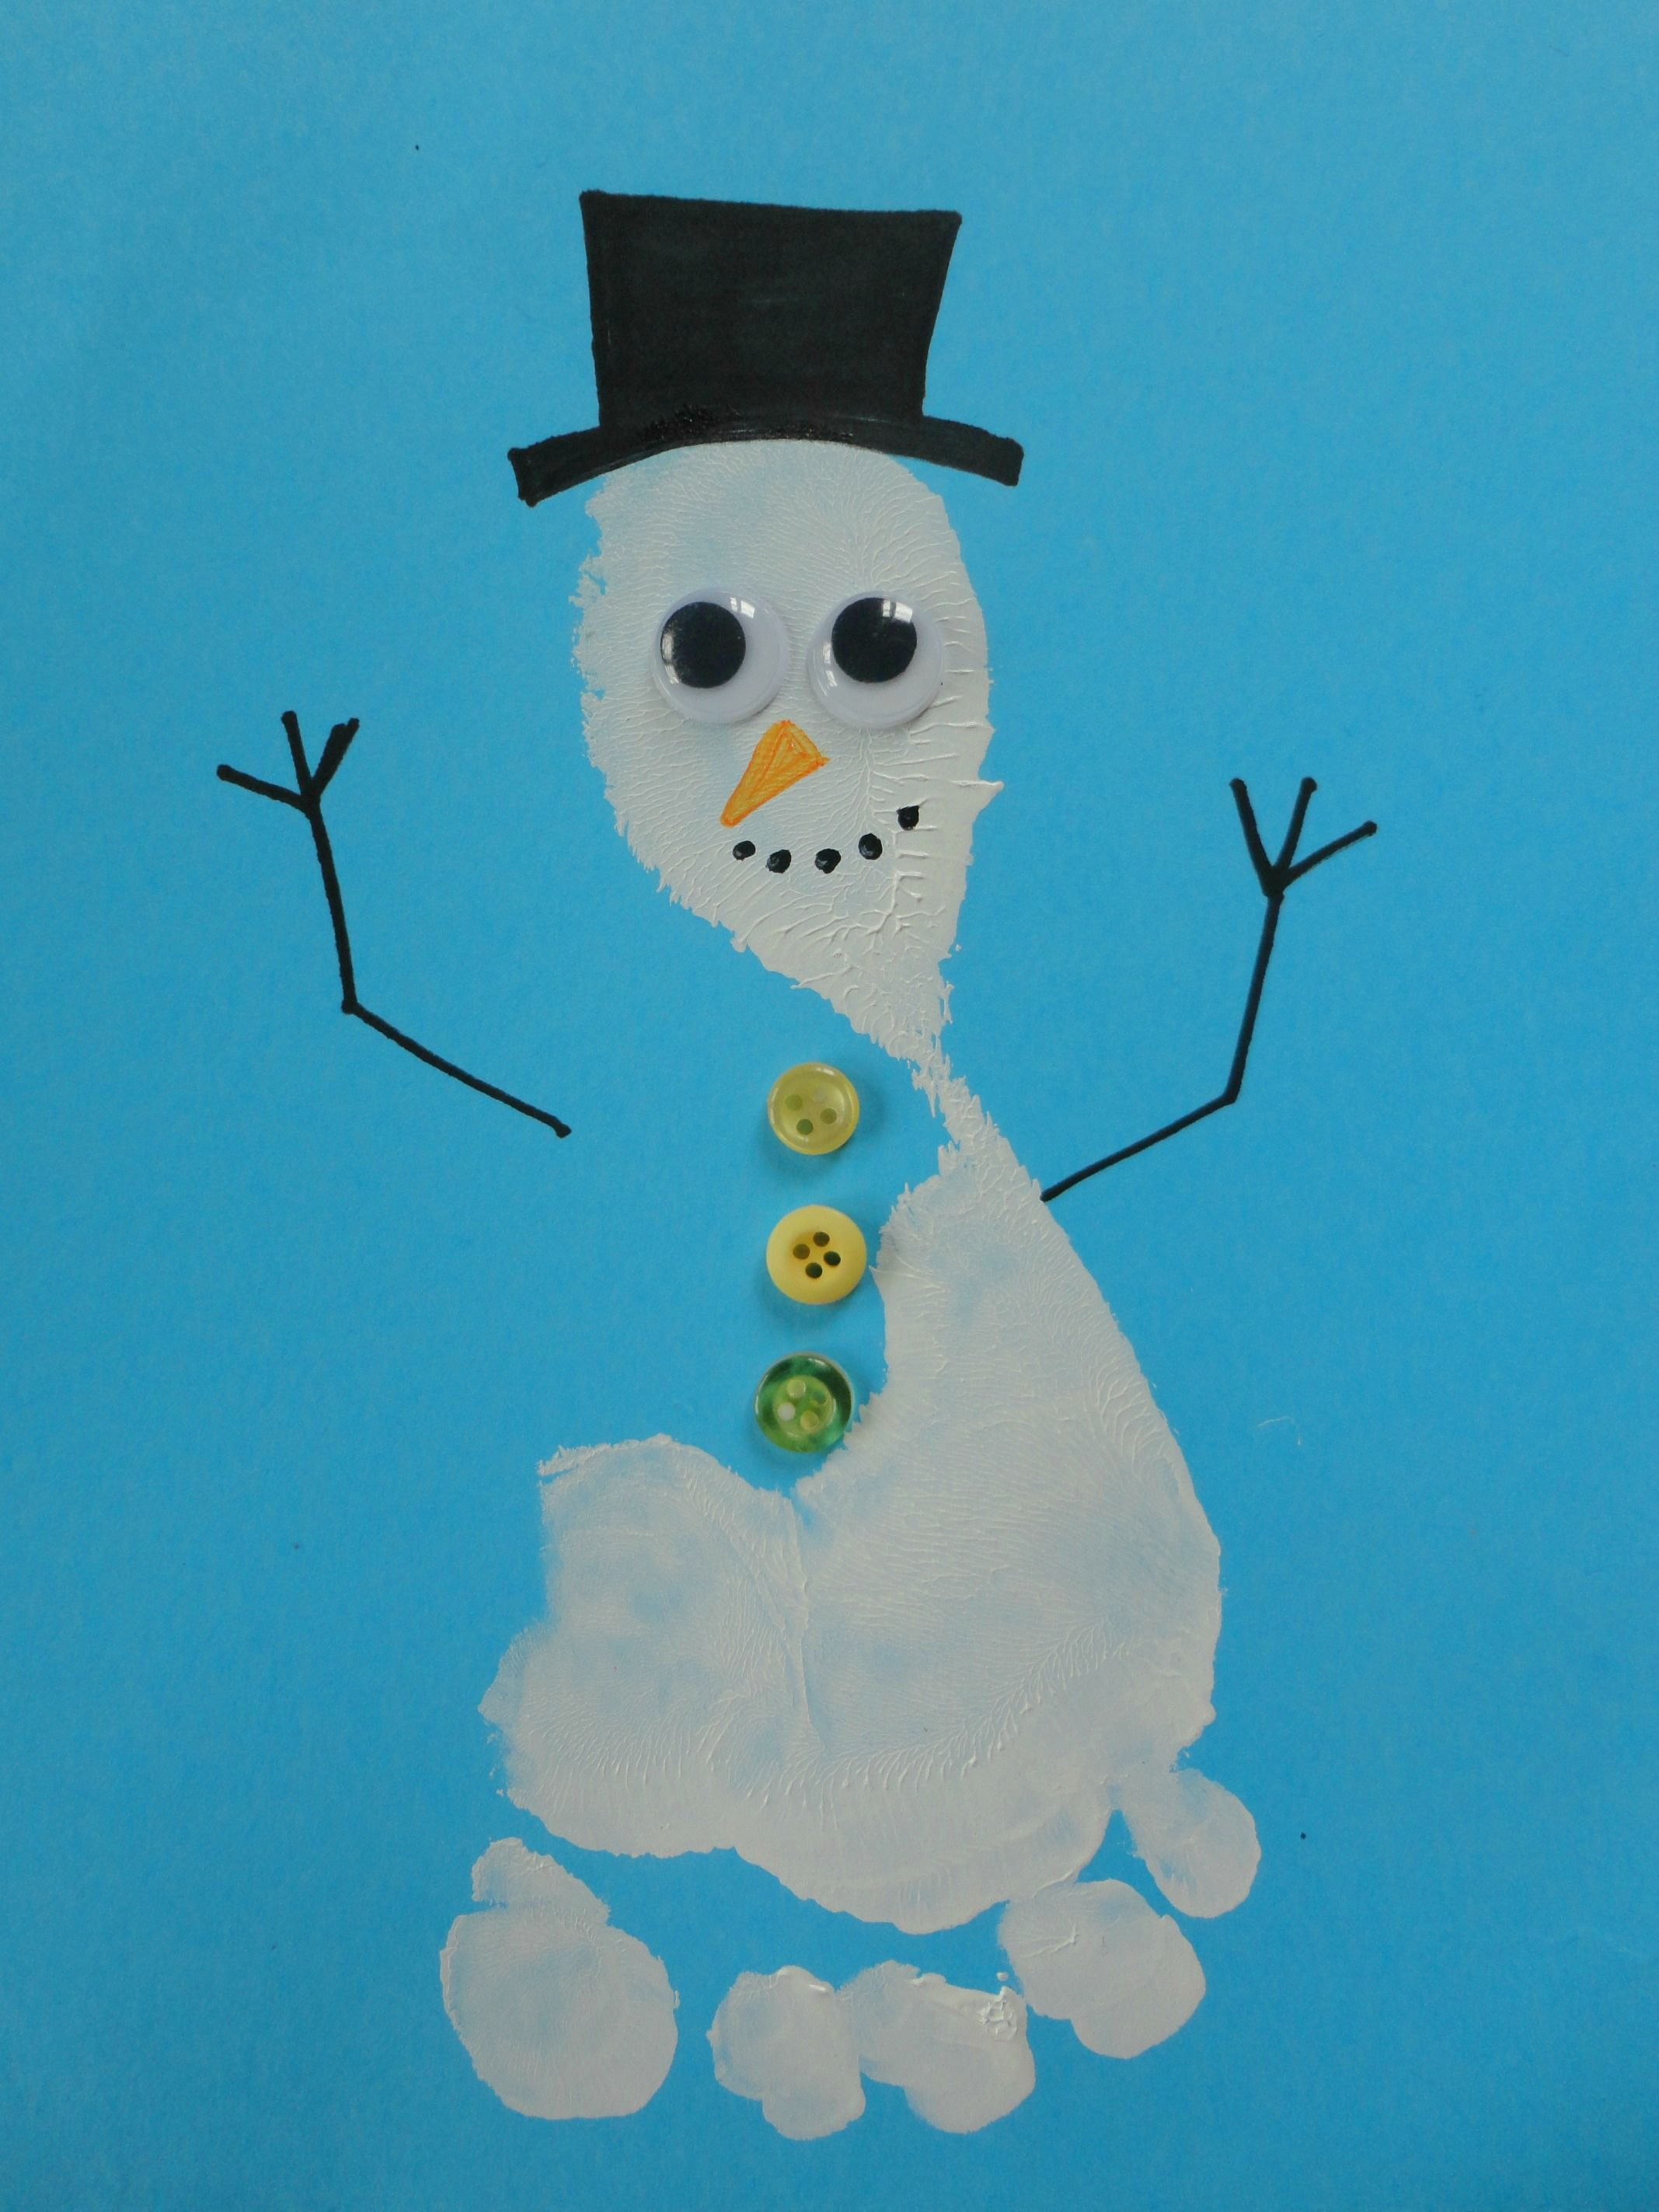 Footprint Snowman #mine | Craft Ideas | Pinterest